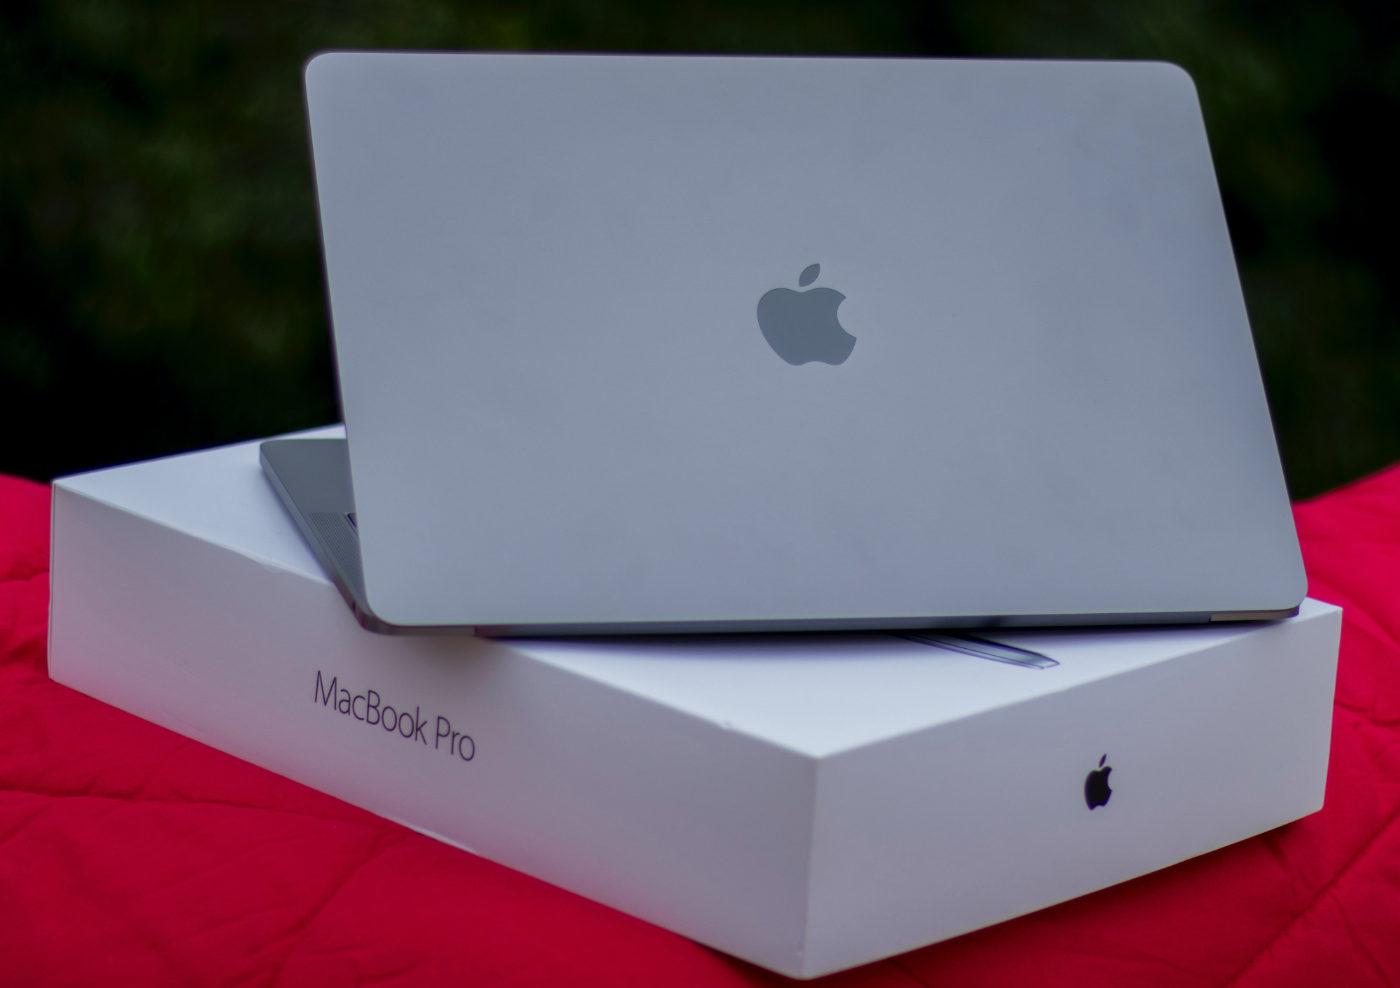 M1x macbookpro oct